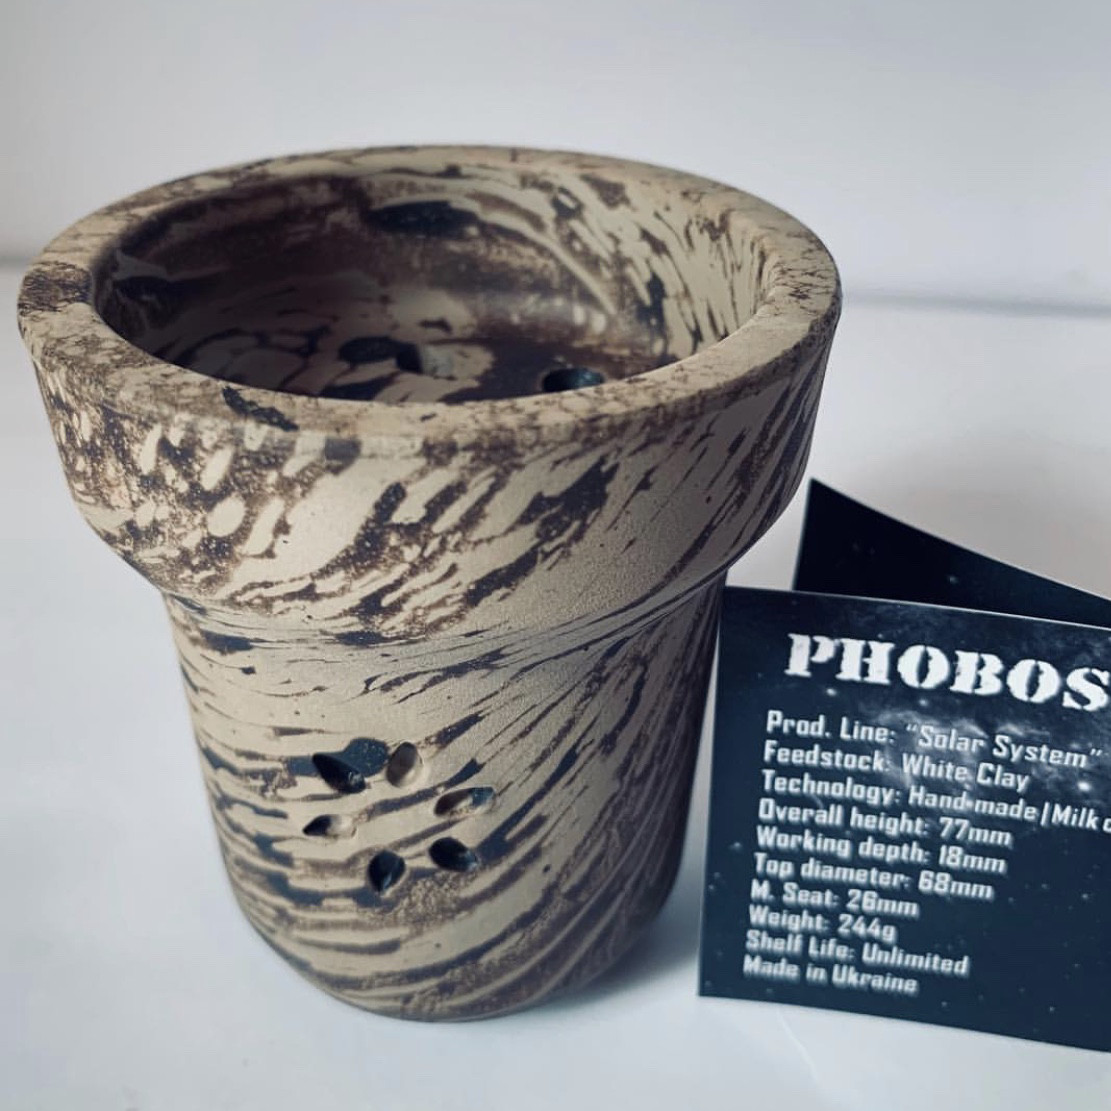 Глиняная чаша для кальяна Solaris (Солярис) - Phobos